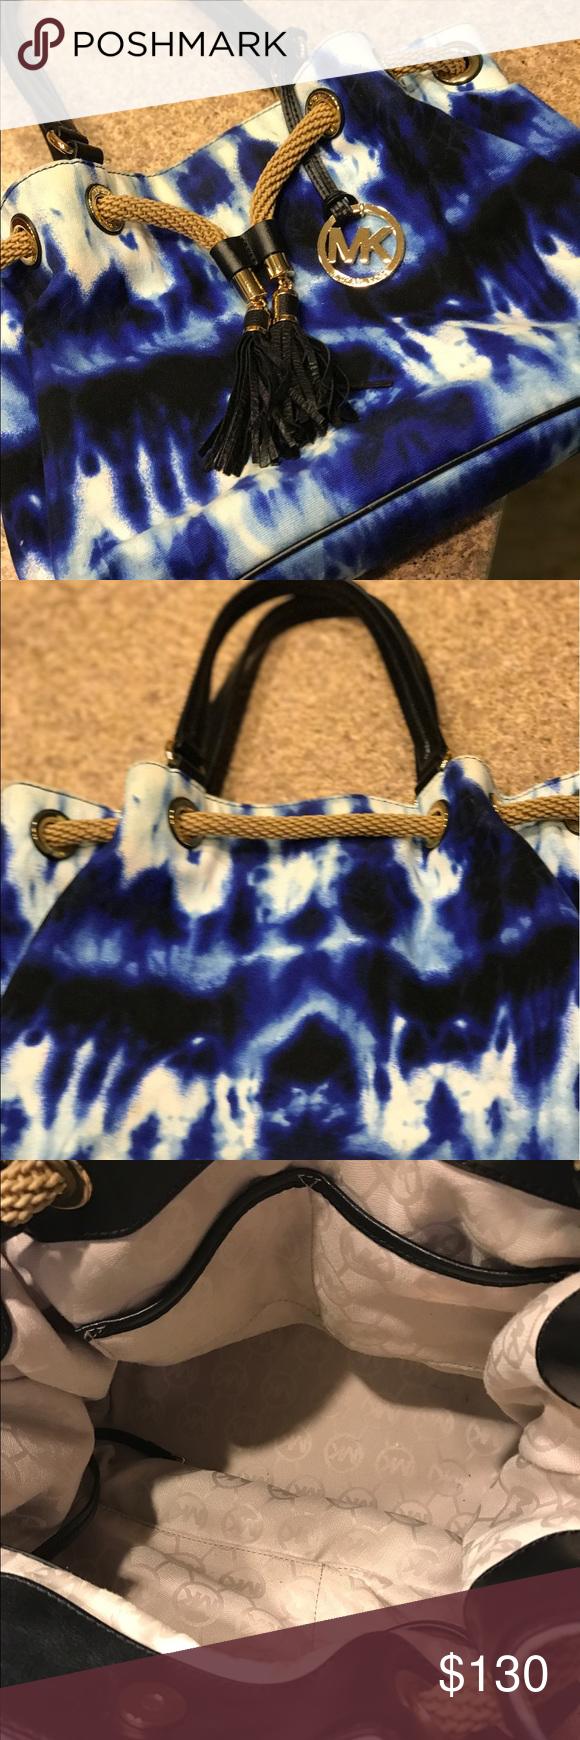 6acba057ce70 Michael Kors Rare MARINA Large Handbag ~ This is a Michael Kors Rare Blue  Tie-dye MARINA Large Gathered Tote Purse Handbag ~ Gently used smoke and  pet free ...